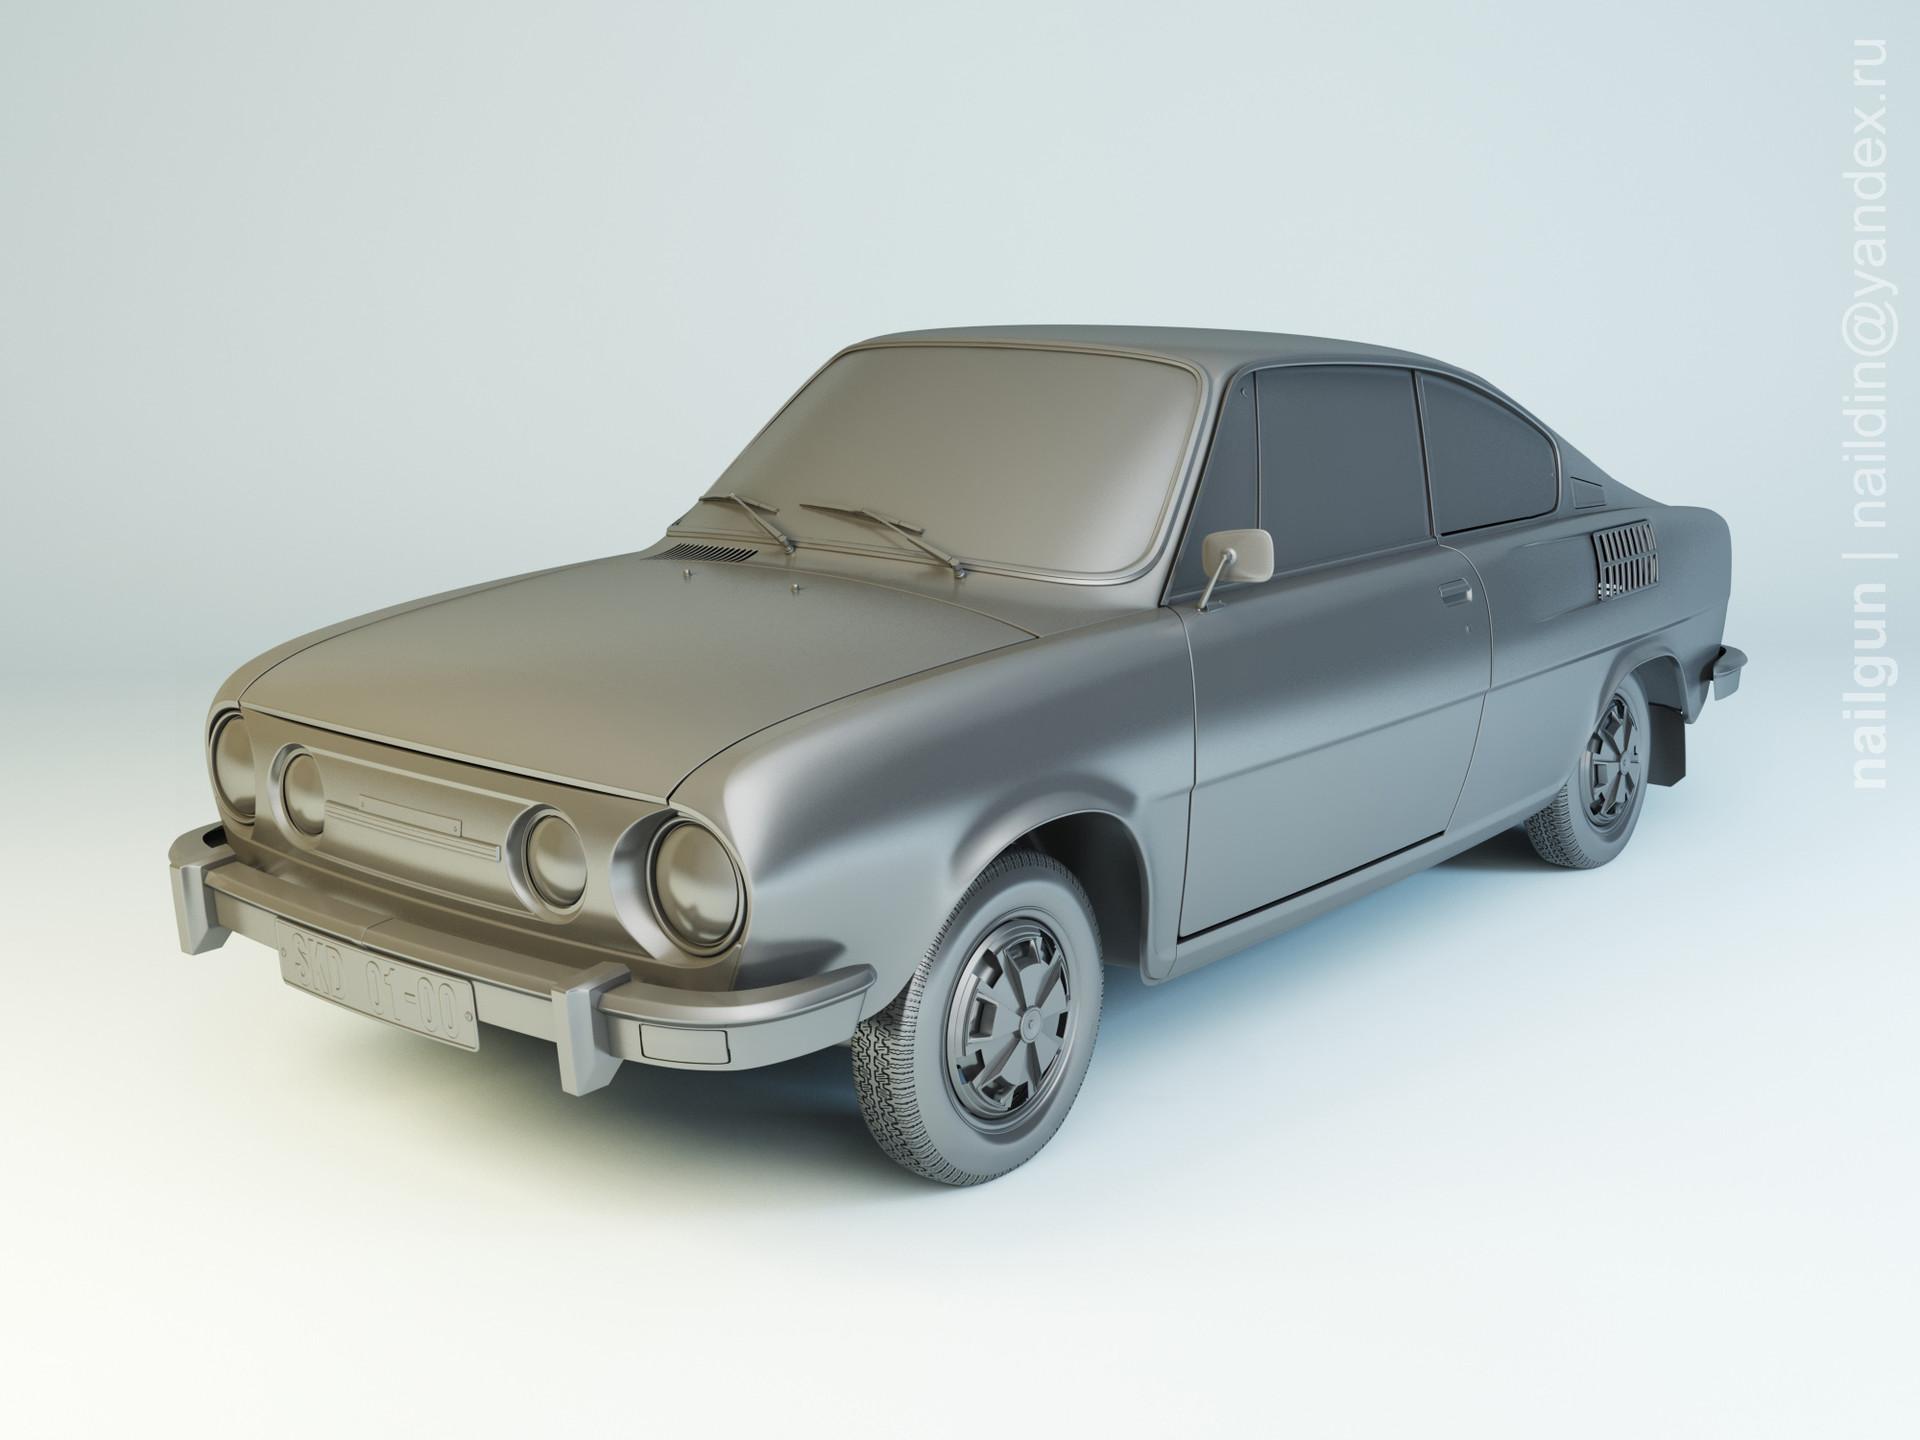 Nail khusnutdinov als 200 002 skoda 110r modelling 0